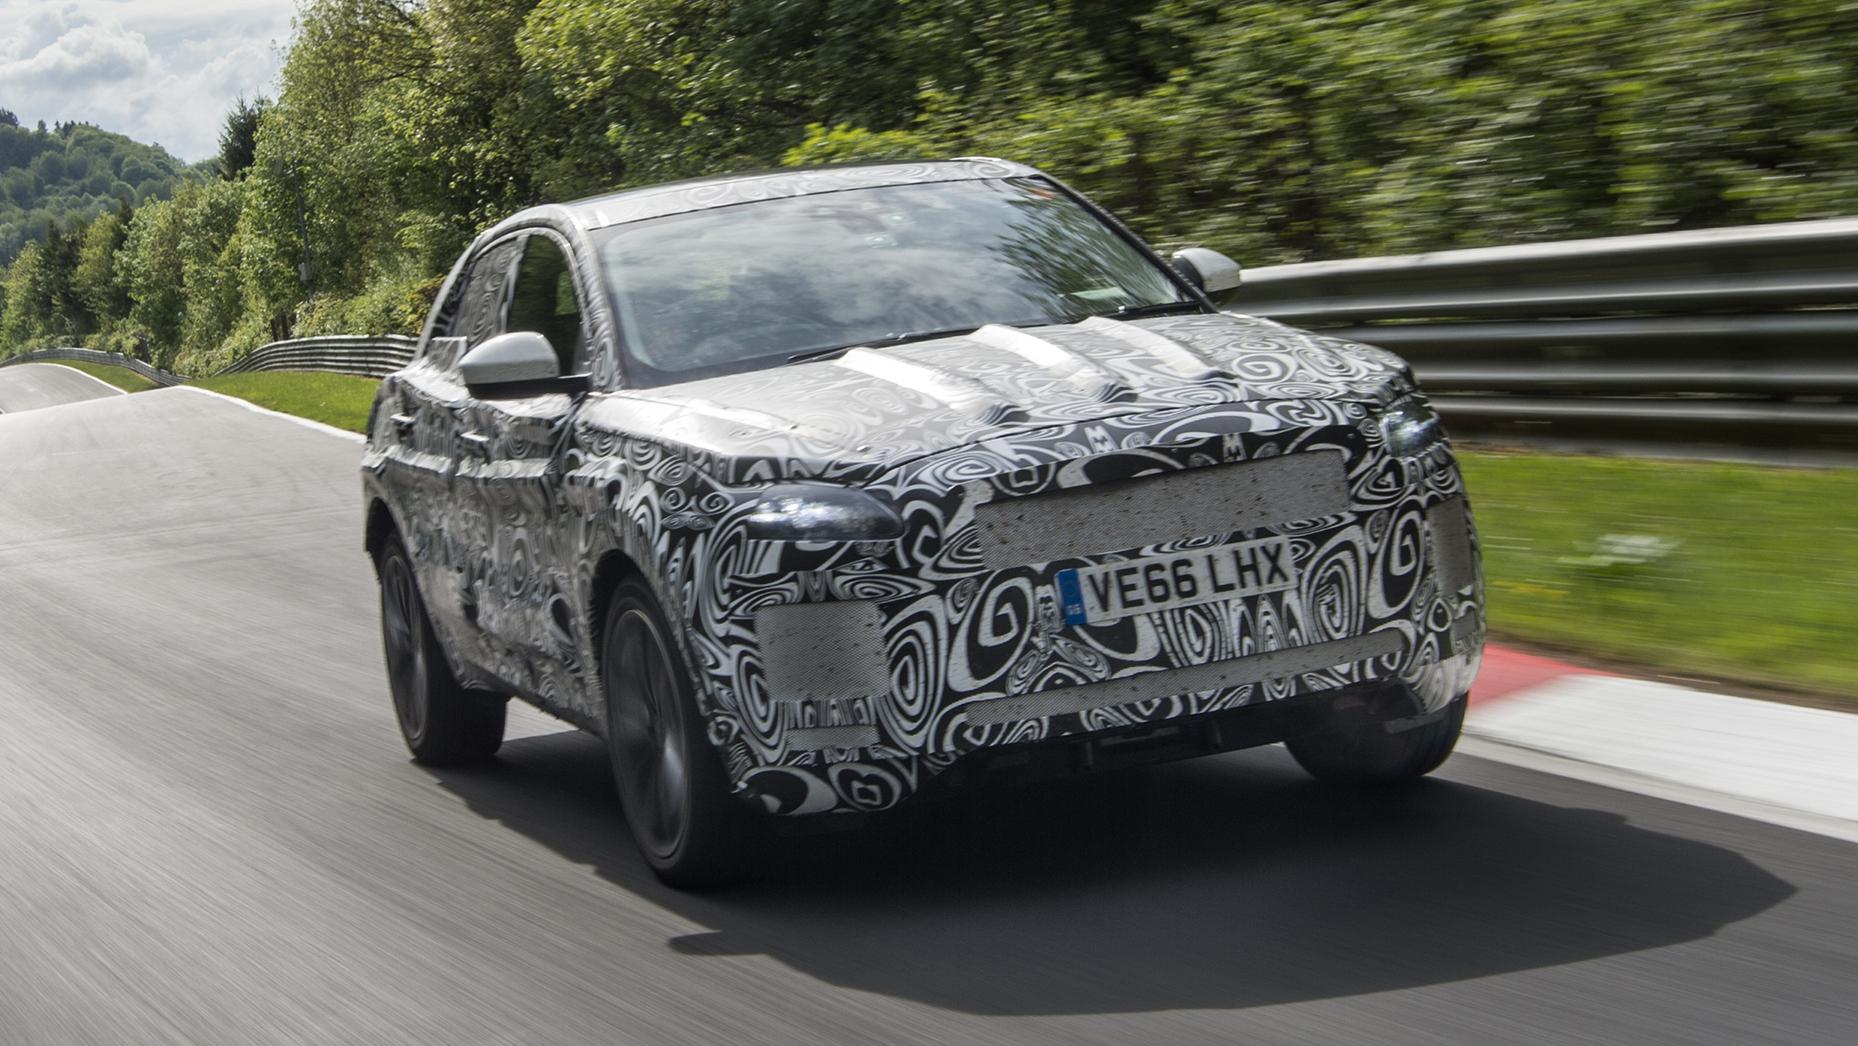 Jaguar E-Pace camo nurburgring